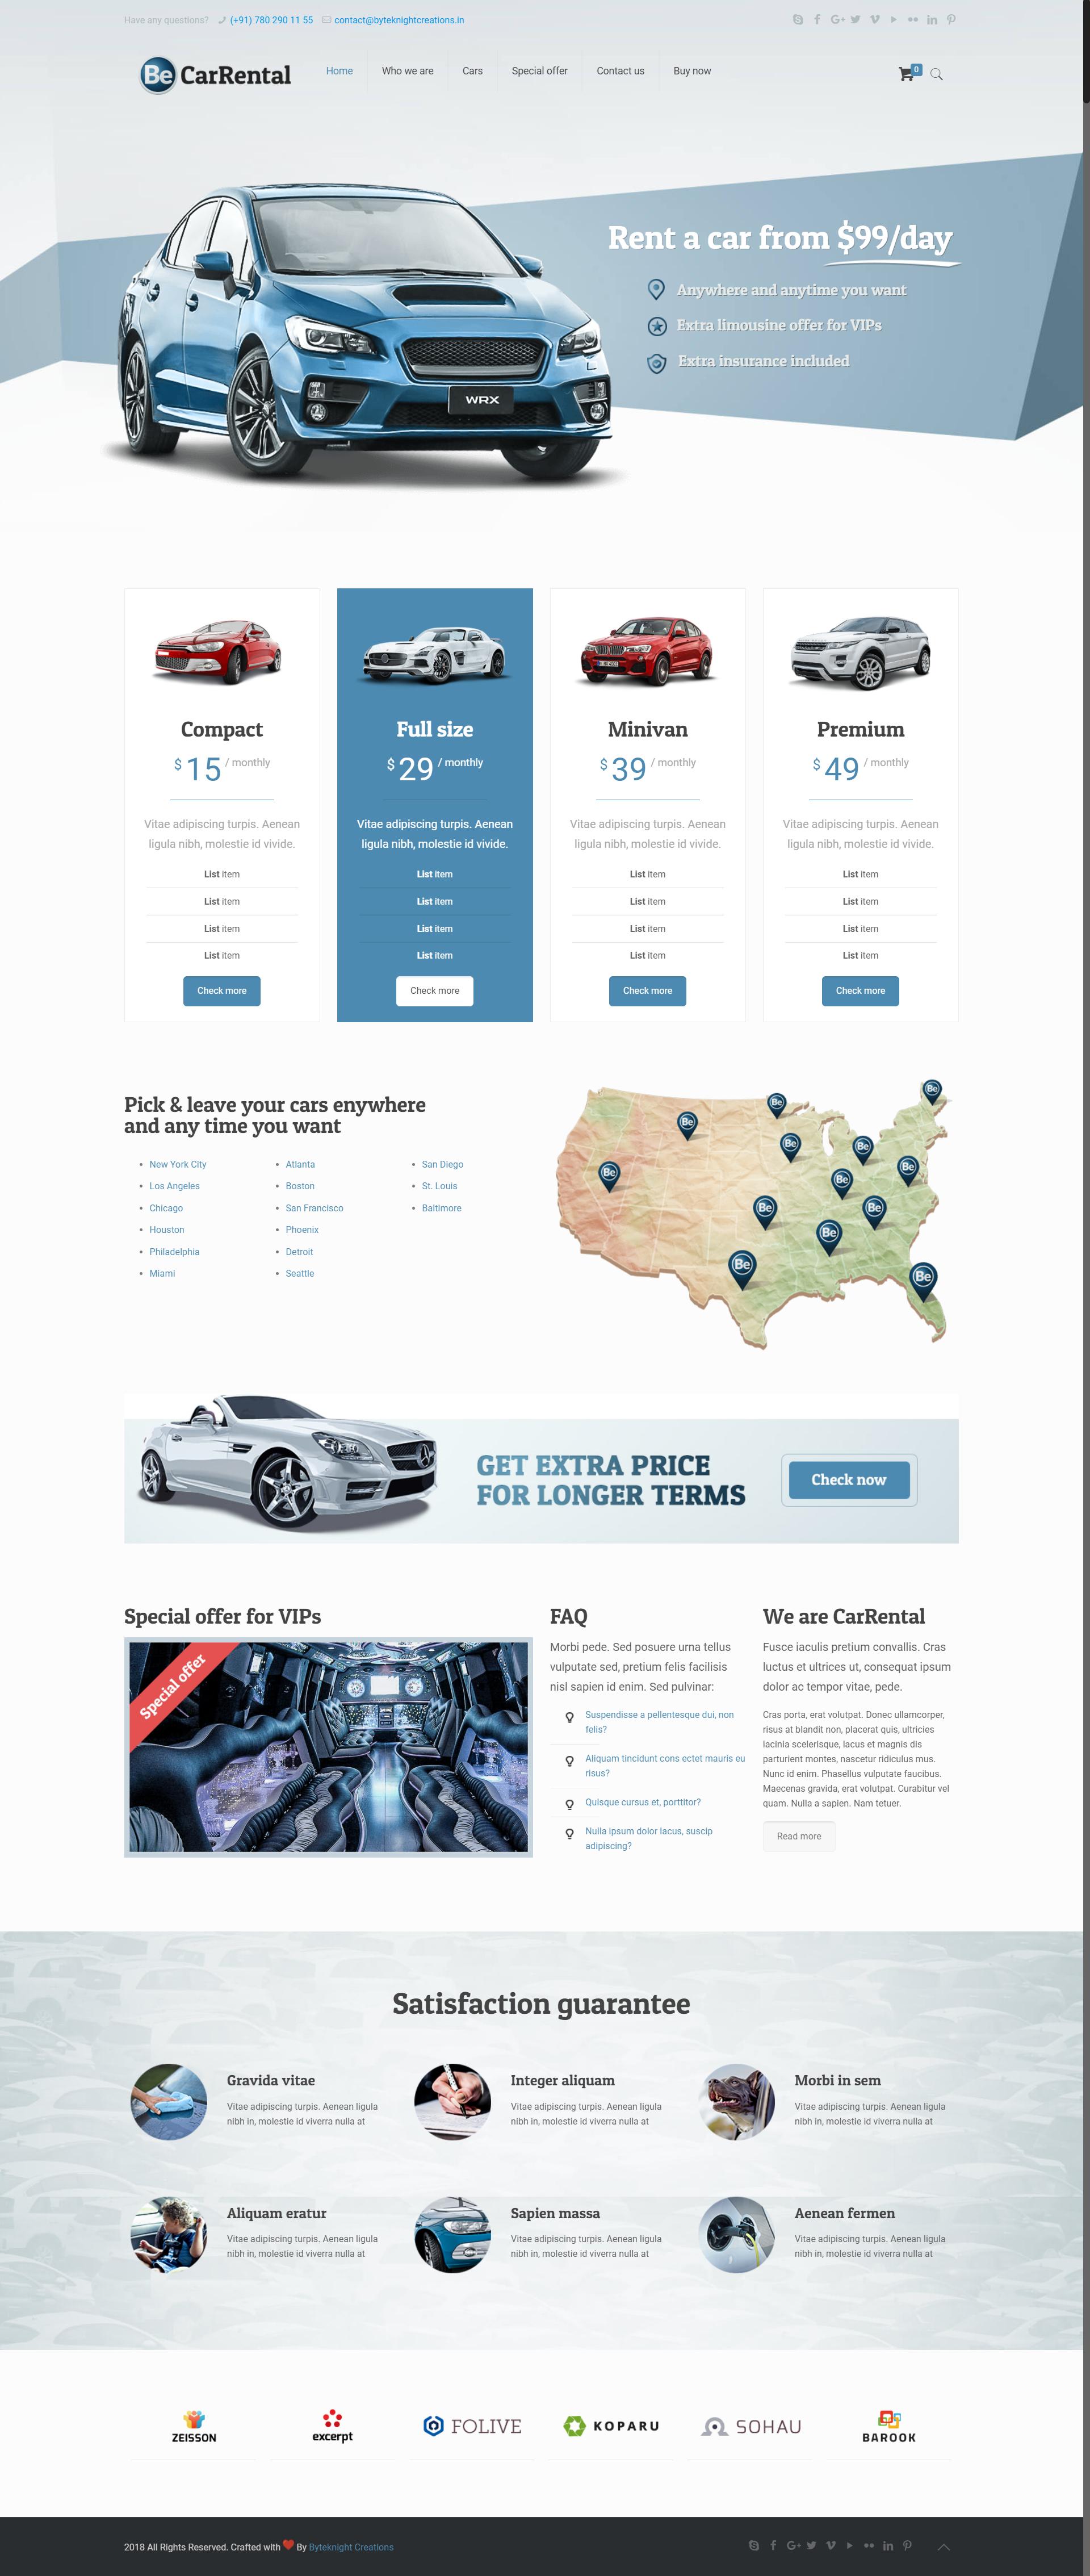 Web Design Themes Templates Car Rental Website Design Demo Byteknightdesigns Bkwebdesigns Websitedesigns Car Rental Website Web Design Tips Web Design